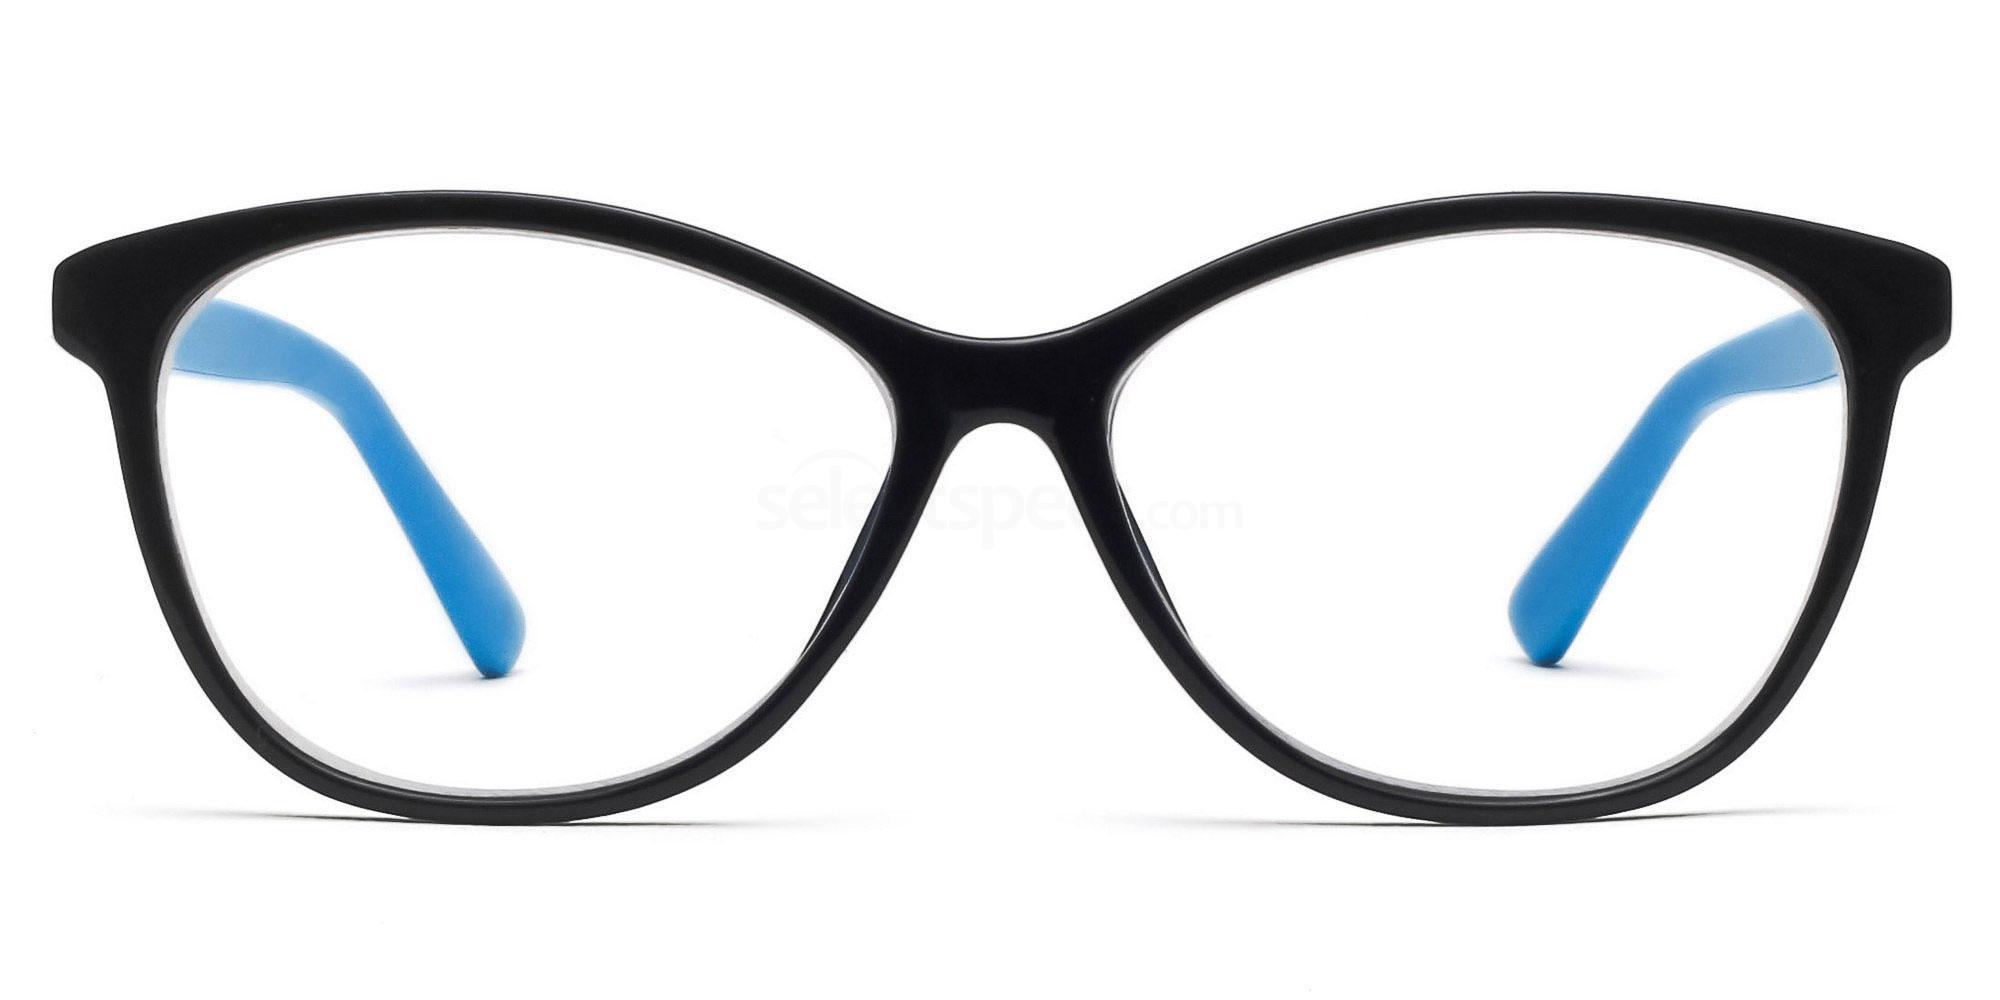 COL.88 2439 - Black and Blue Glasses, Savannah